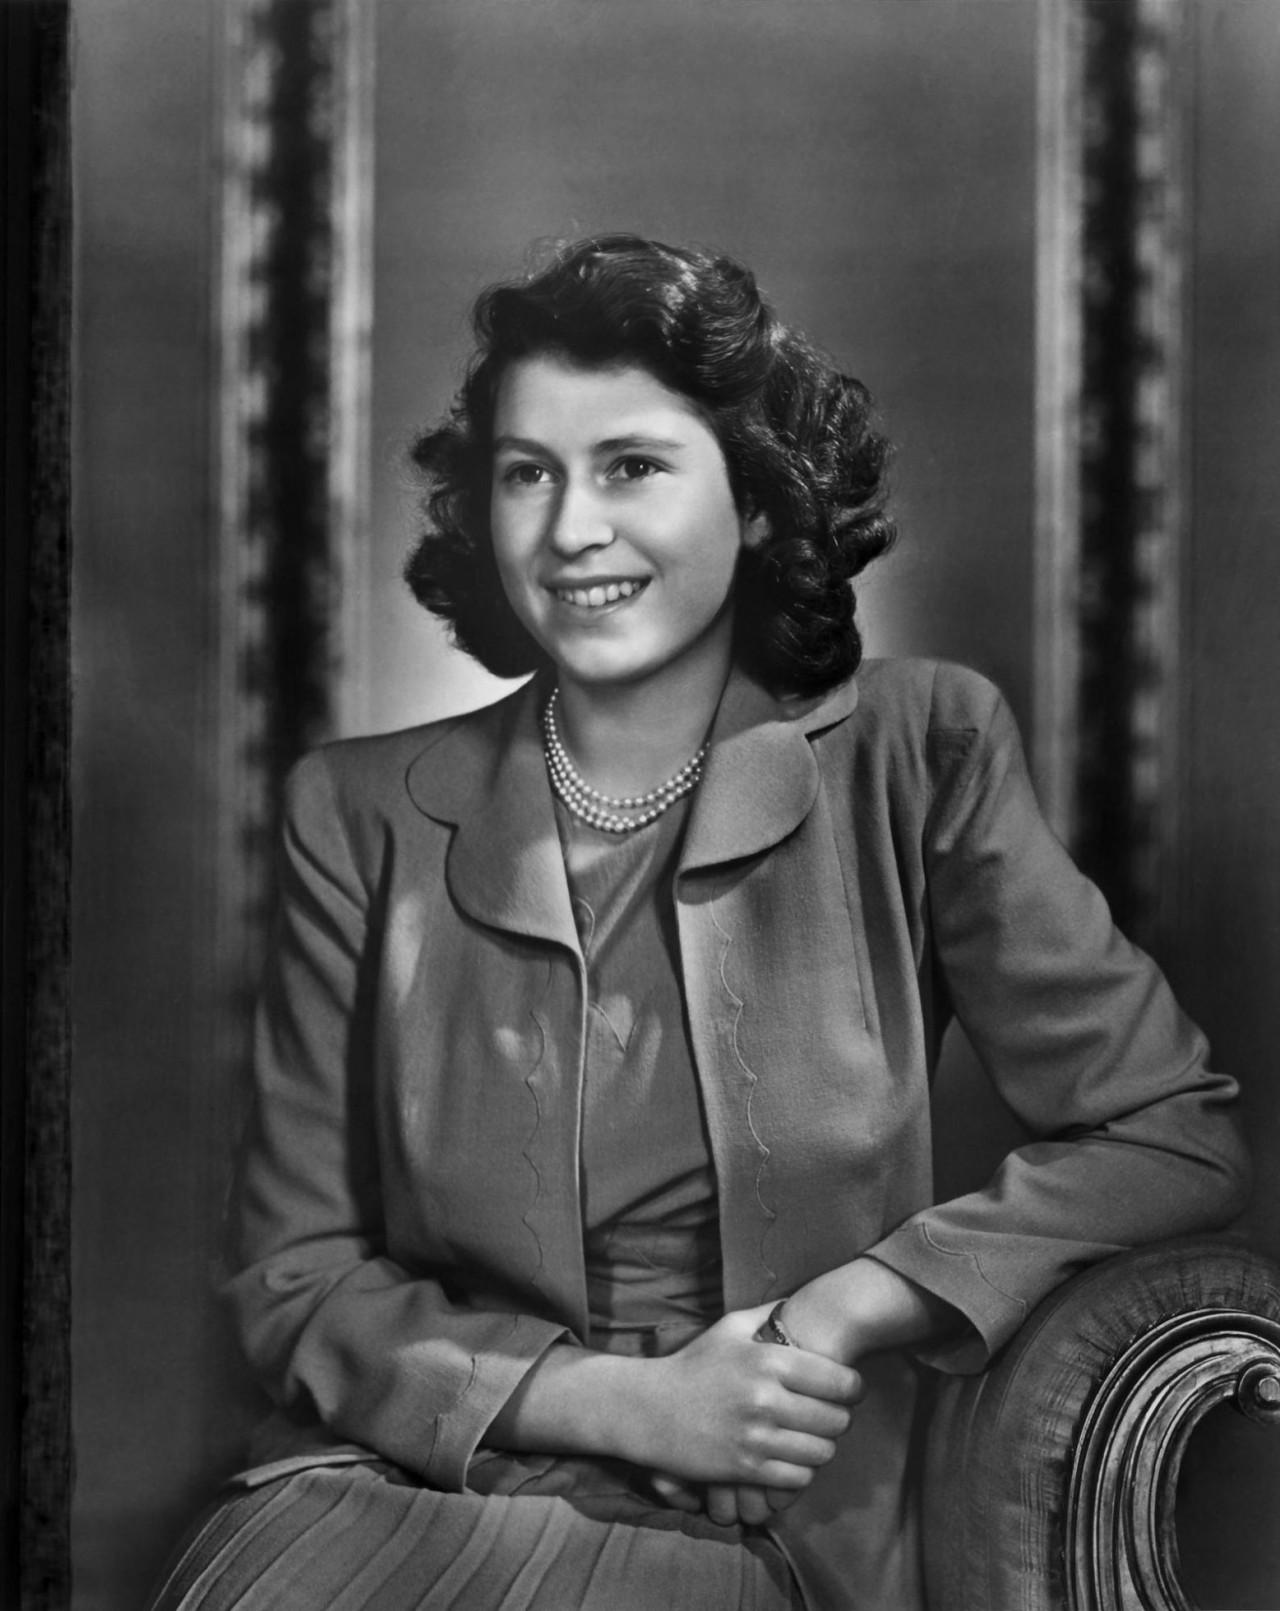 Принцесса Елизавета (будущая королева Елизавета II), 1943. Автор Юсуф Карш